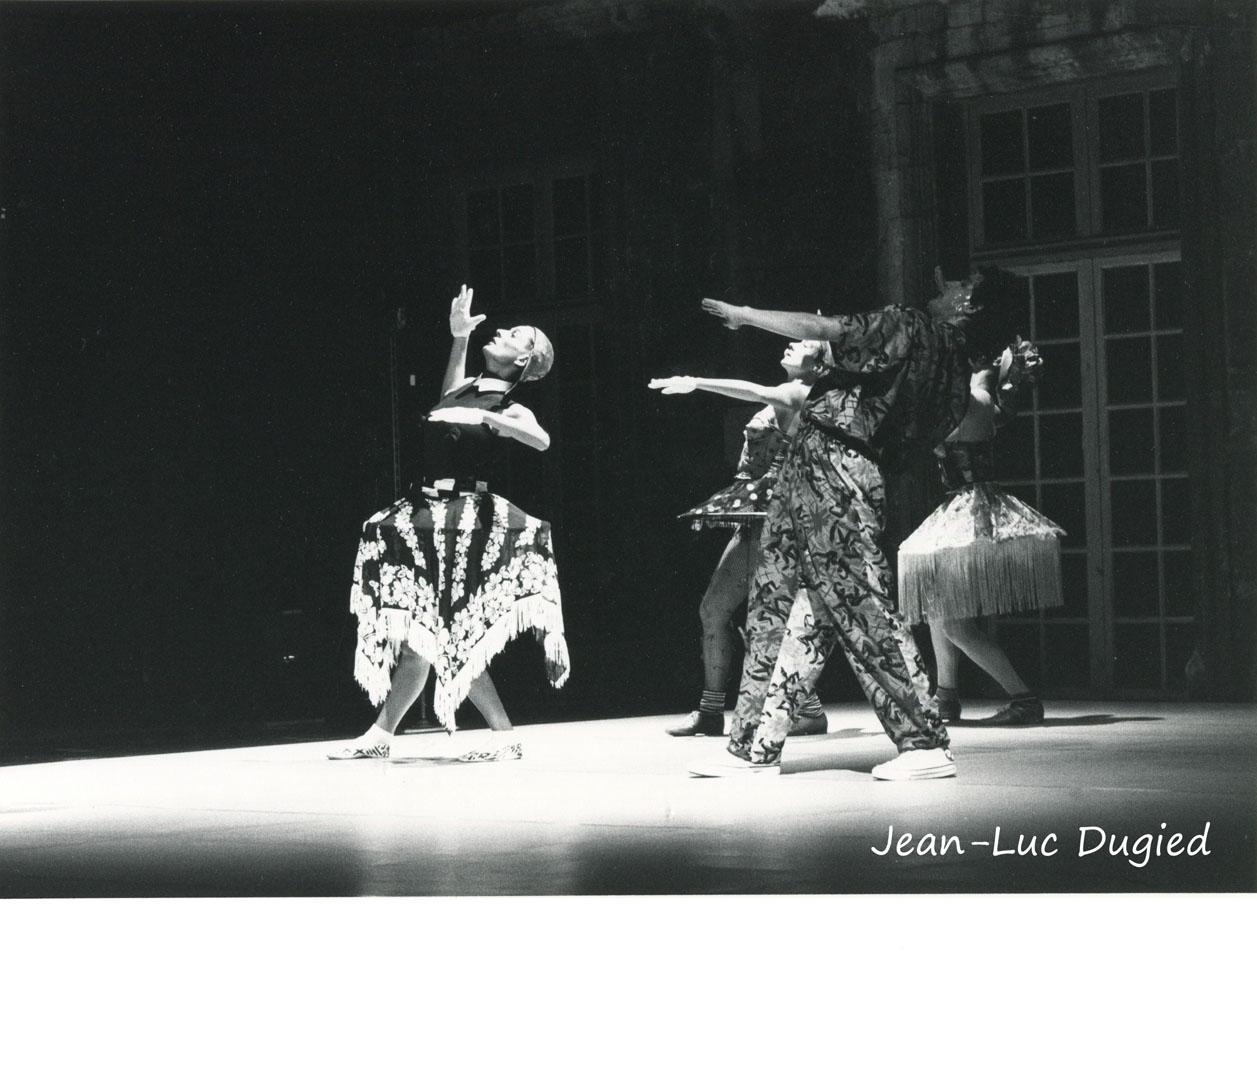 8 Chopinot Régine - Via - 1984